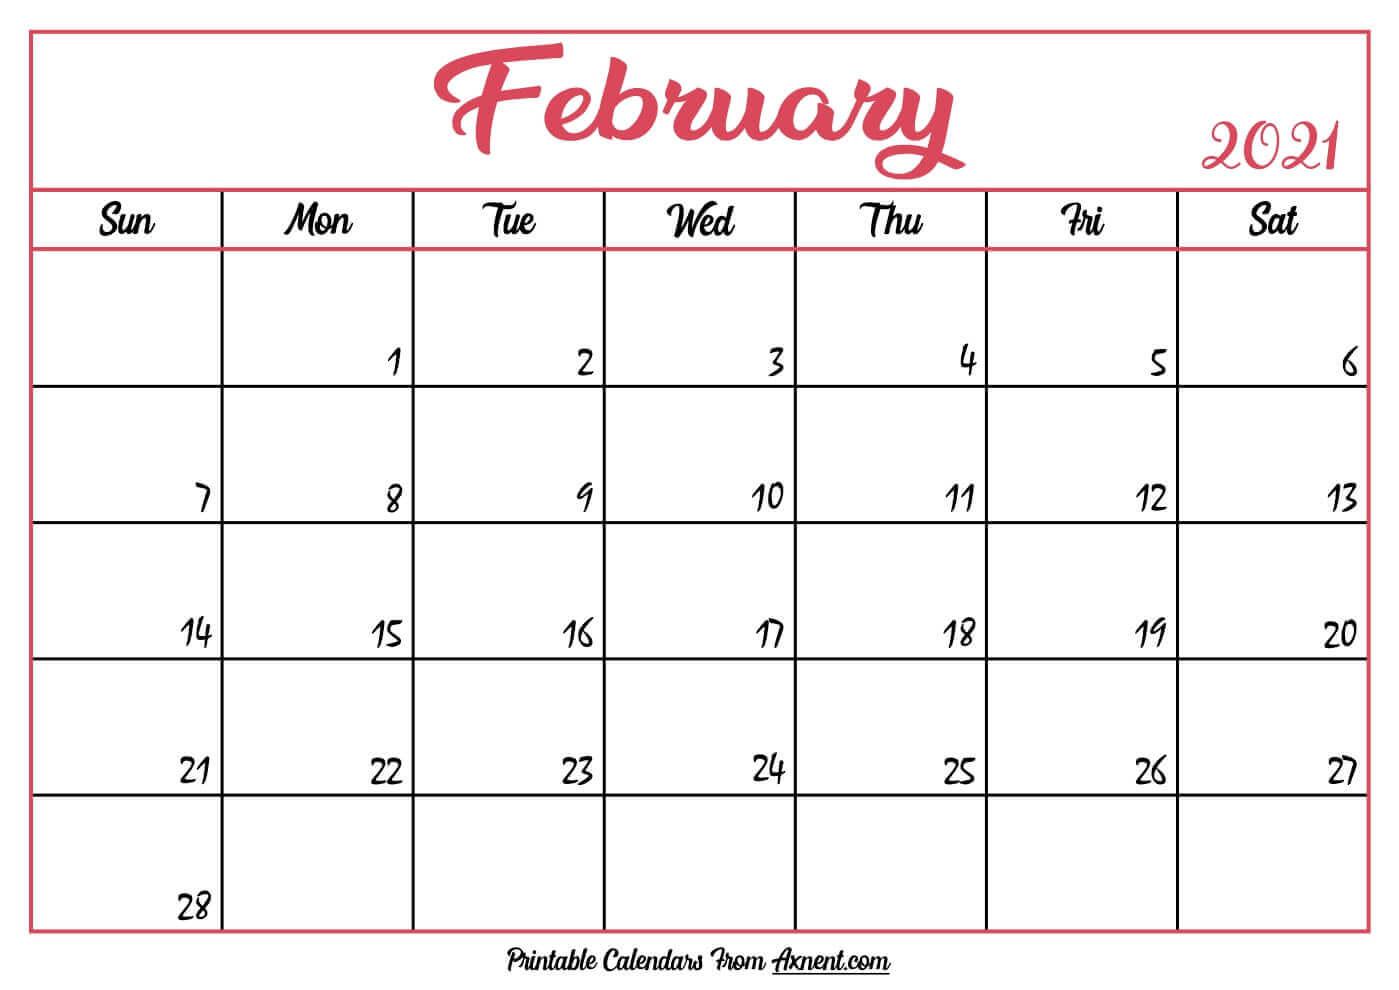 Cute February 2021 Calendar